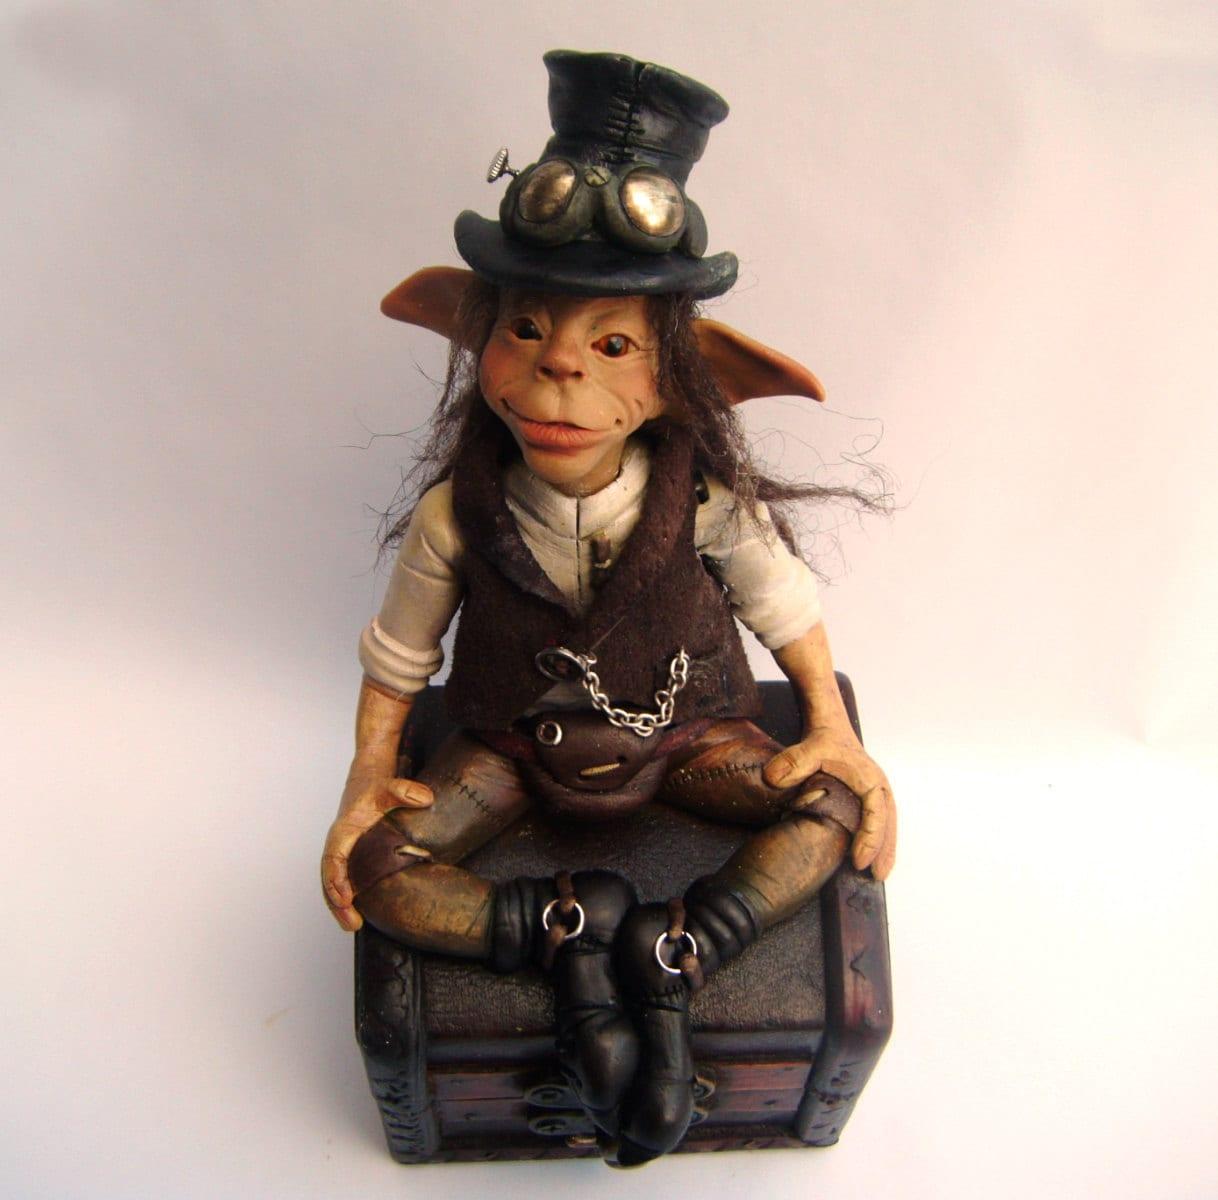 Handmade OOAK faerie elvin character Steampunk Pete